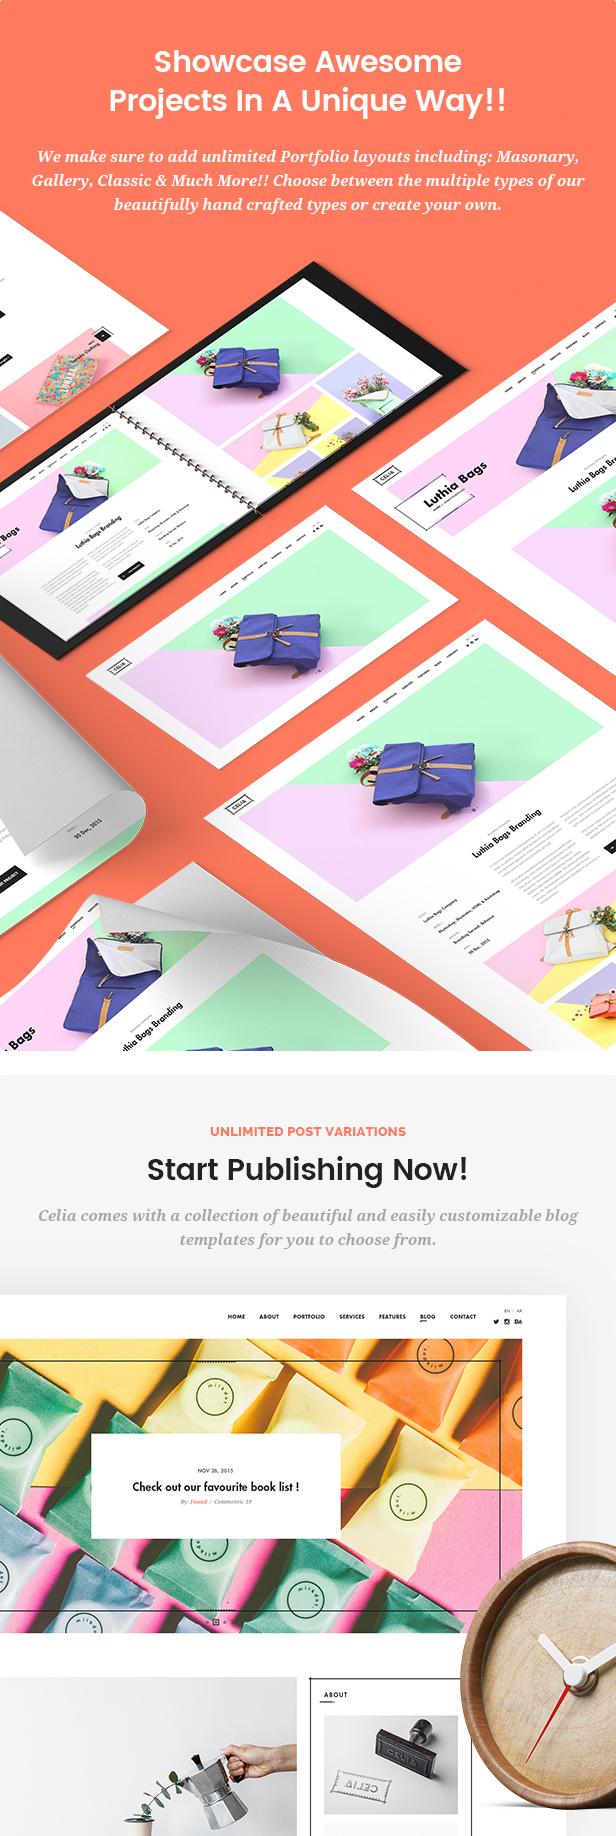 Celia - Innovative and Inspiring Portfolio WordPress Theme for Modern Agencies and Freelancers - 3